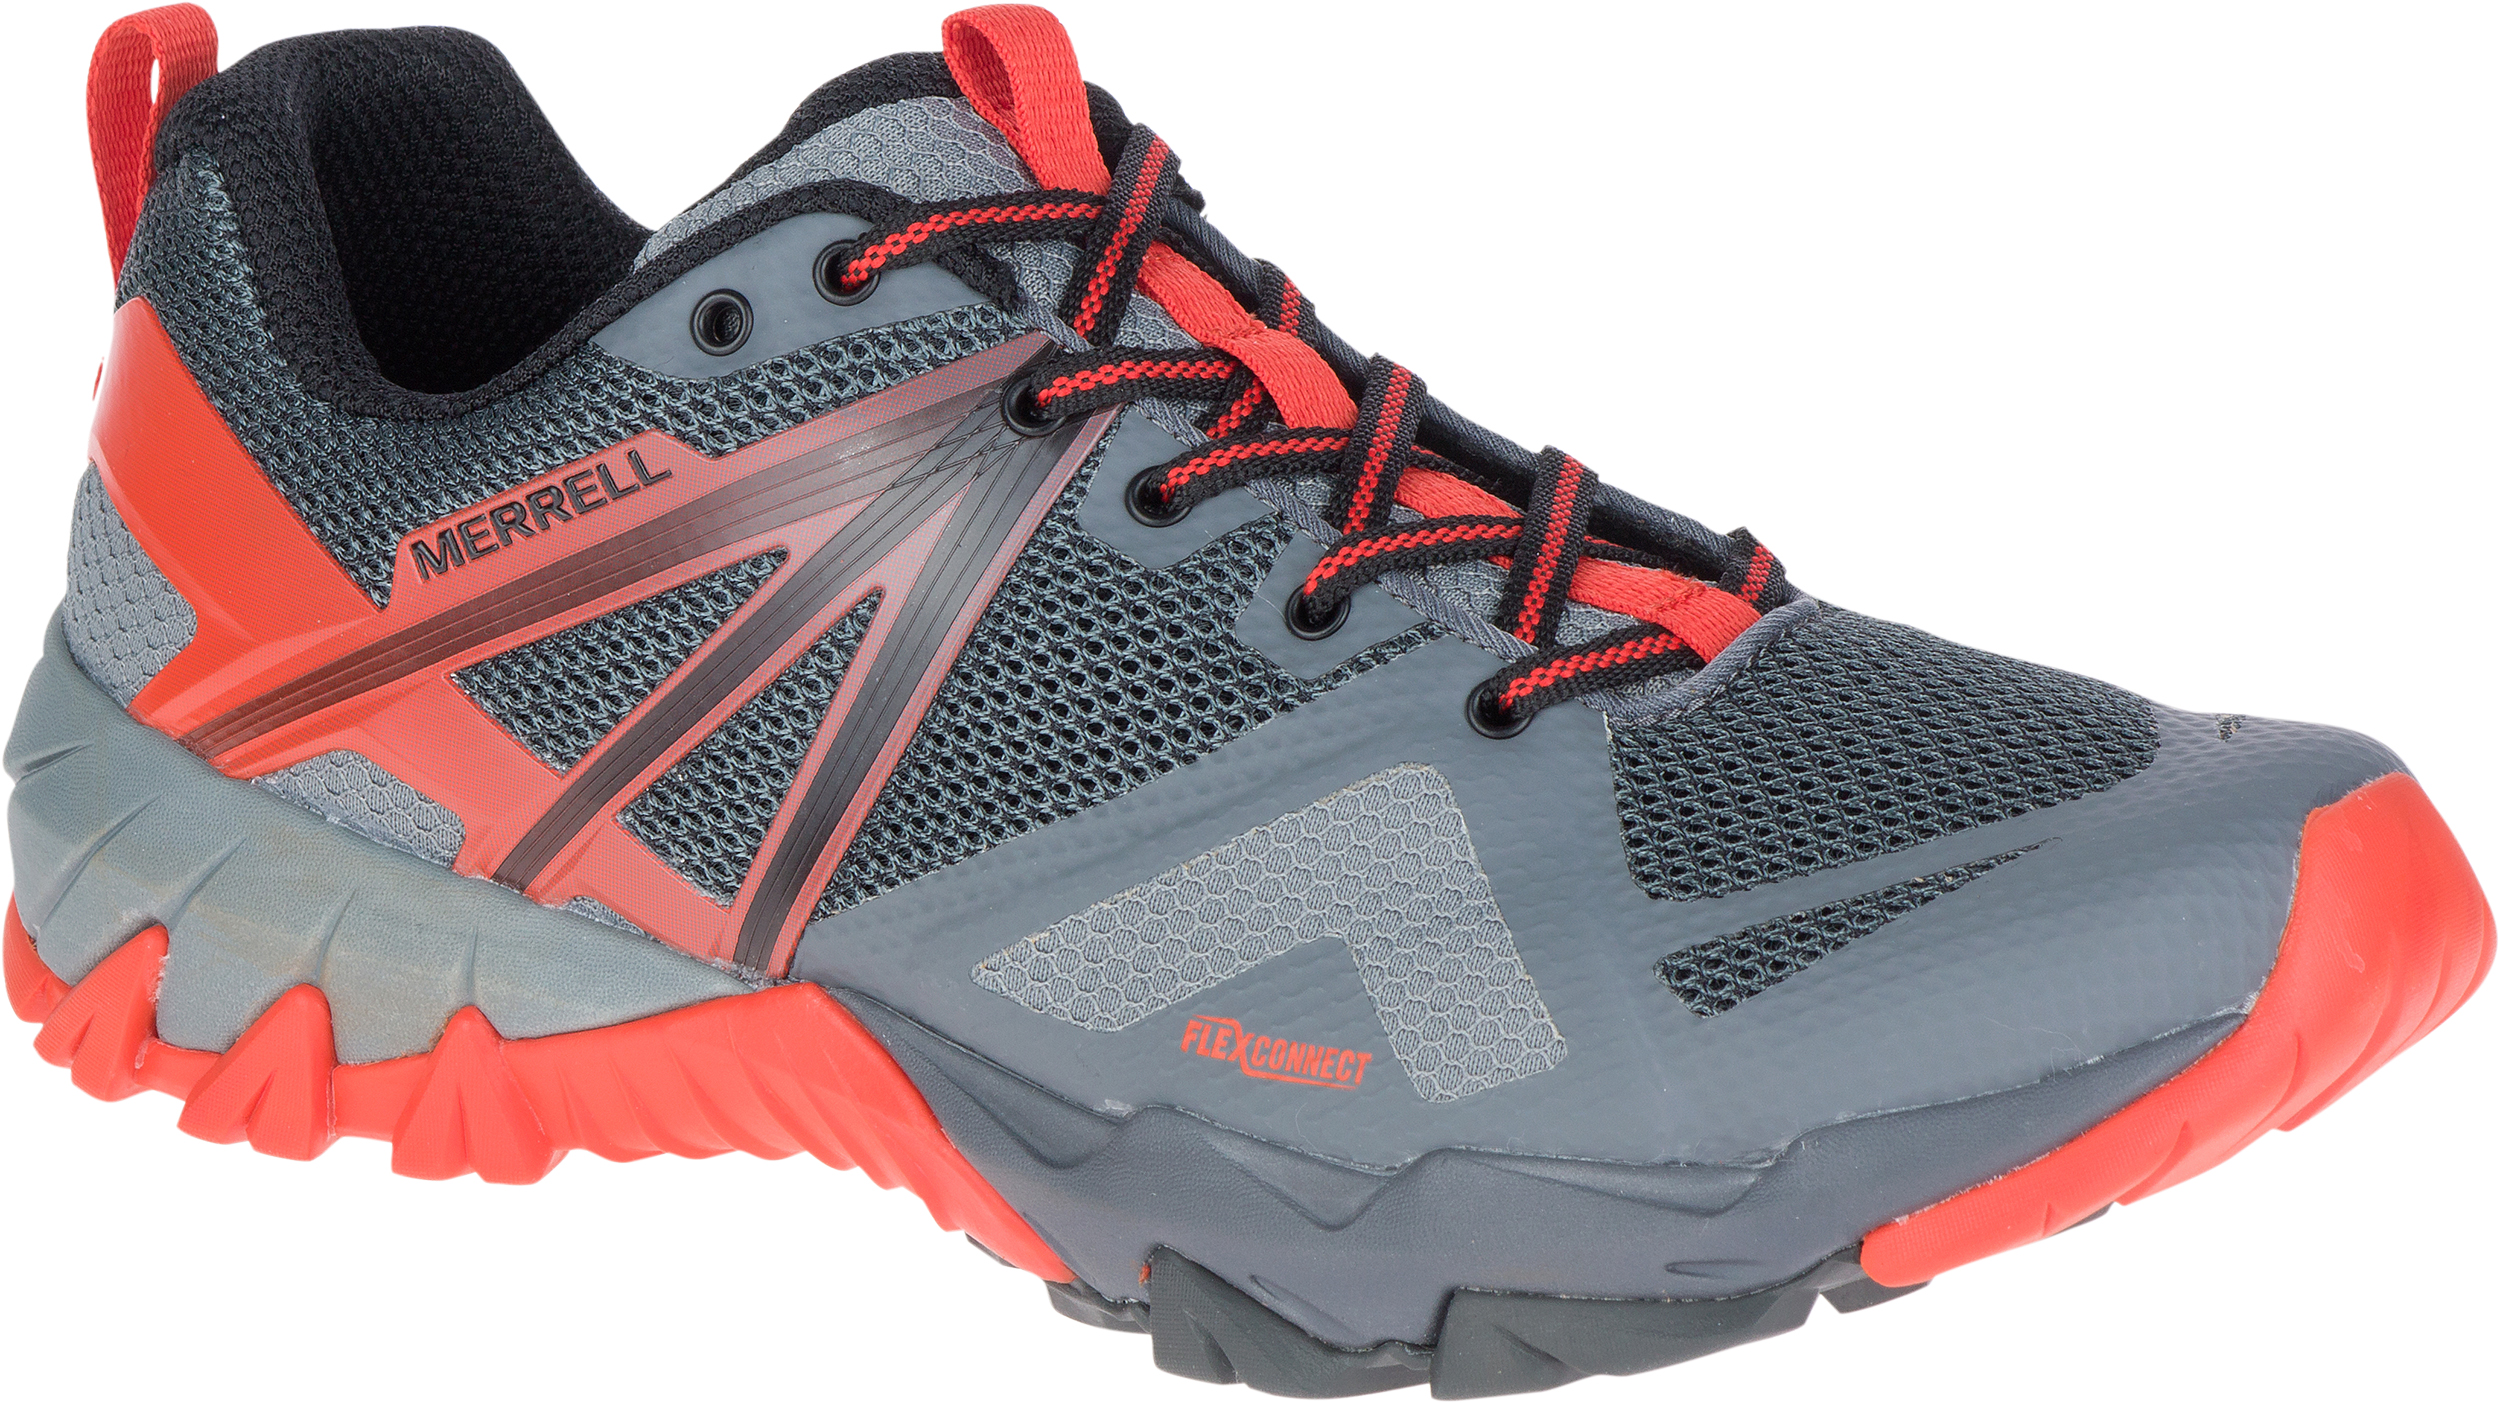 a416b242bae Merrell Hiking footwear